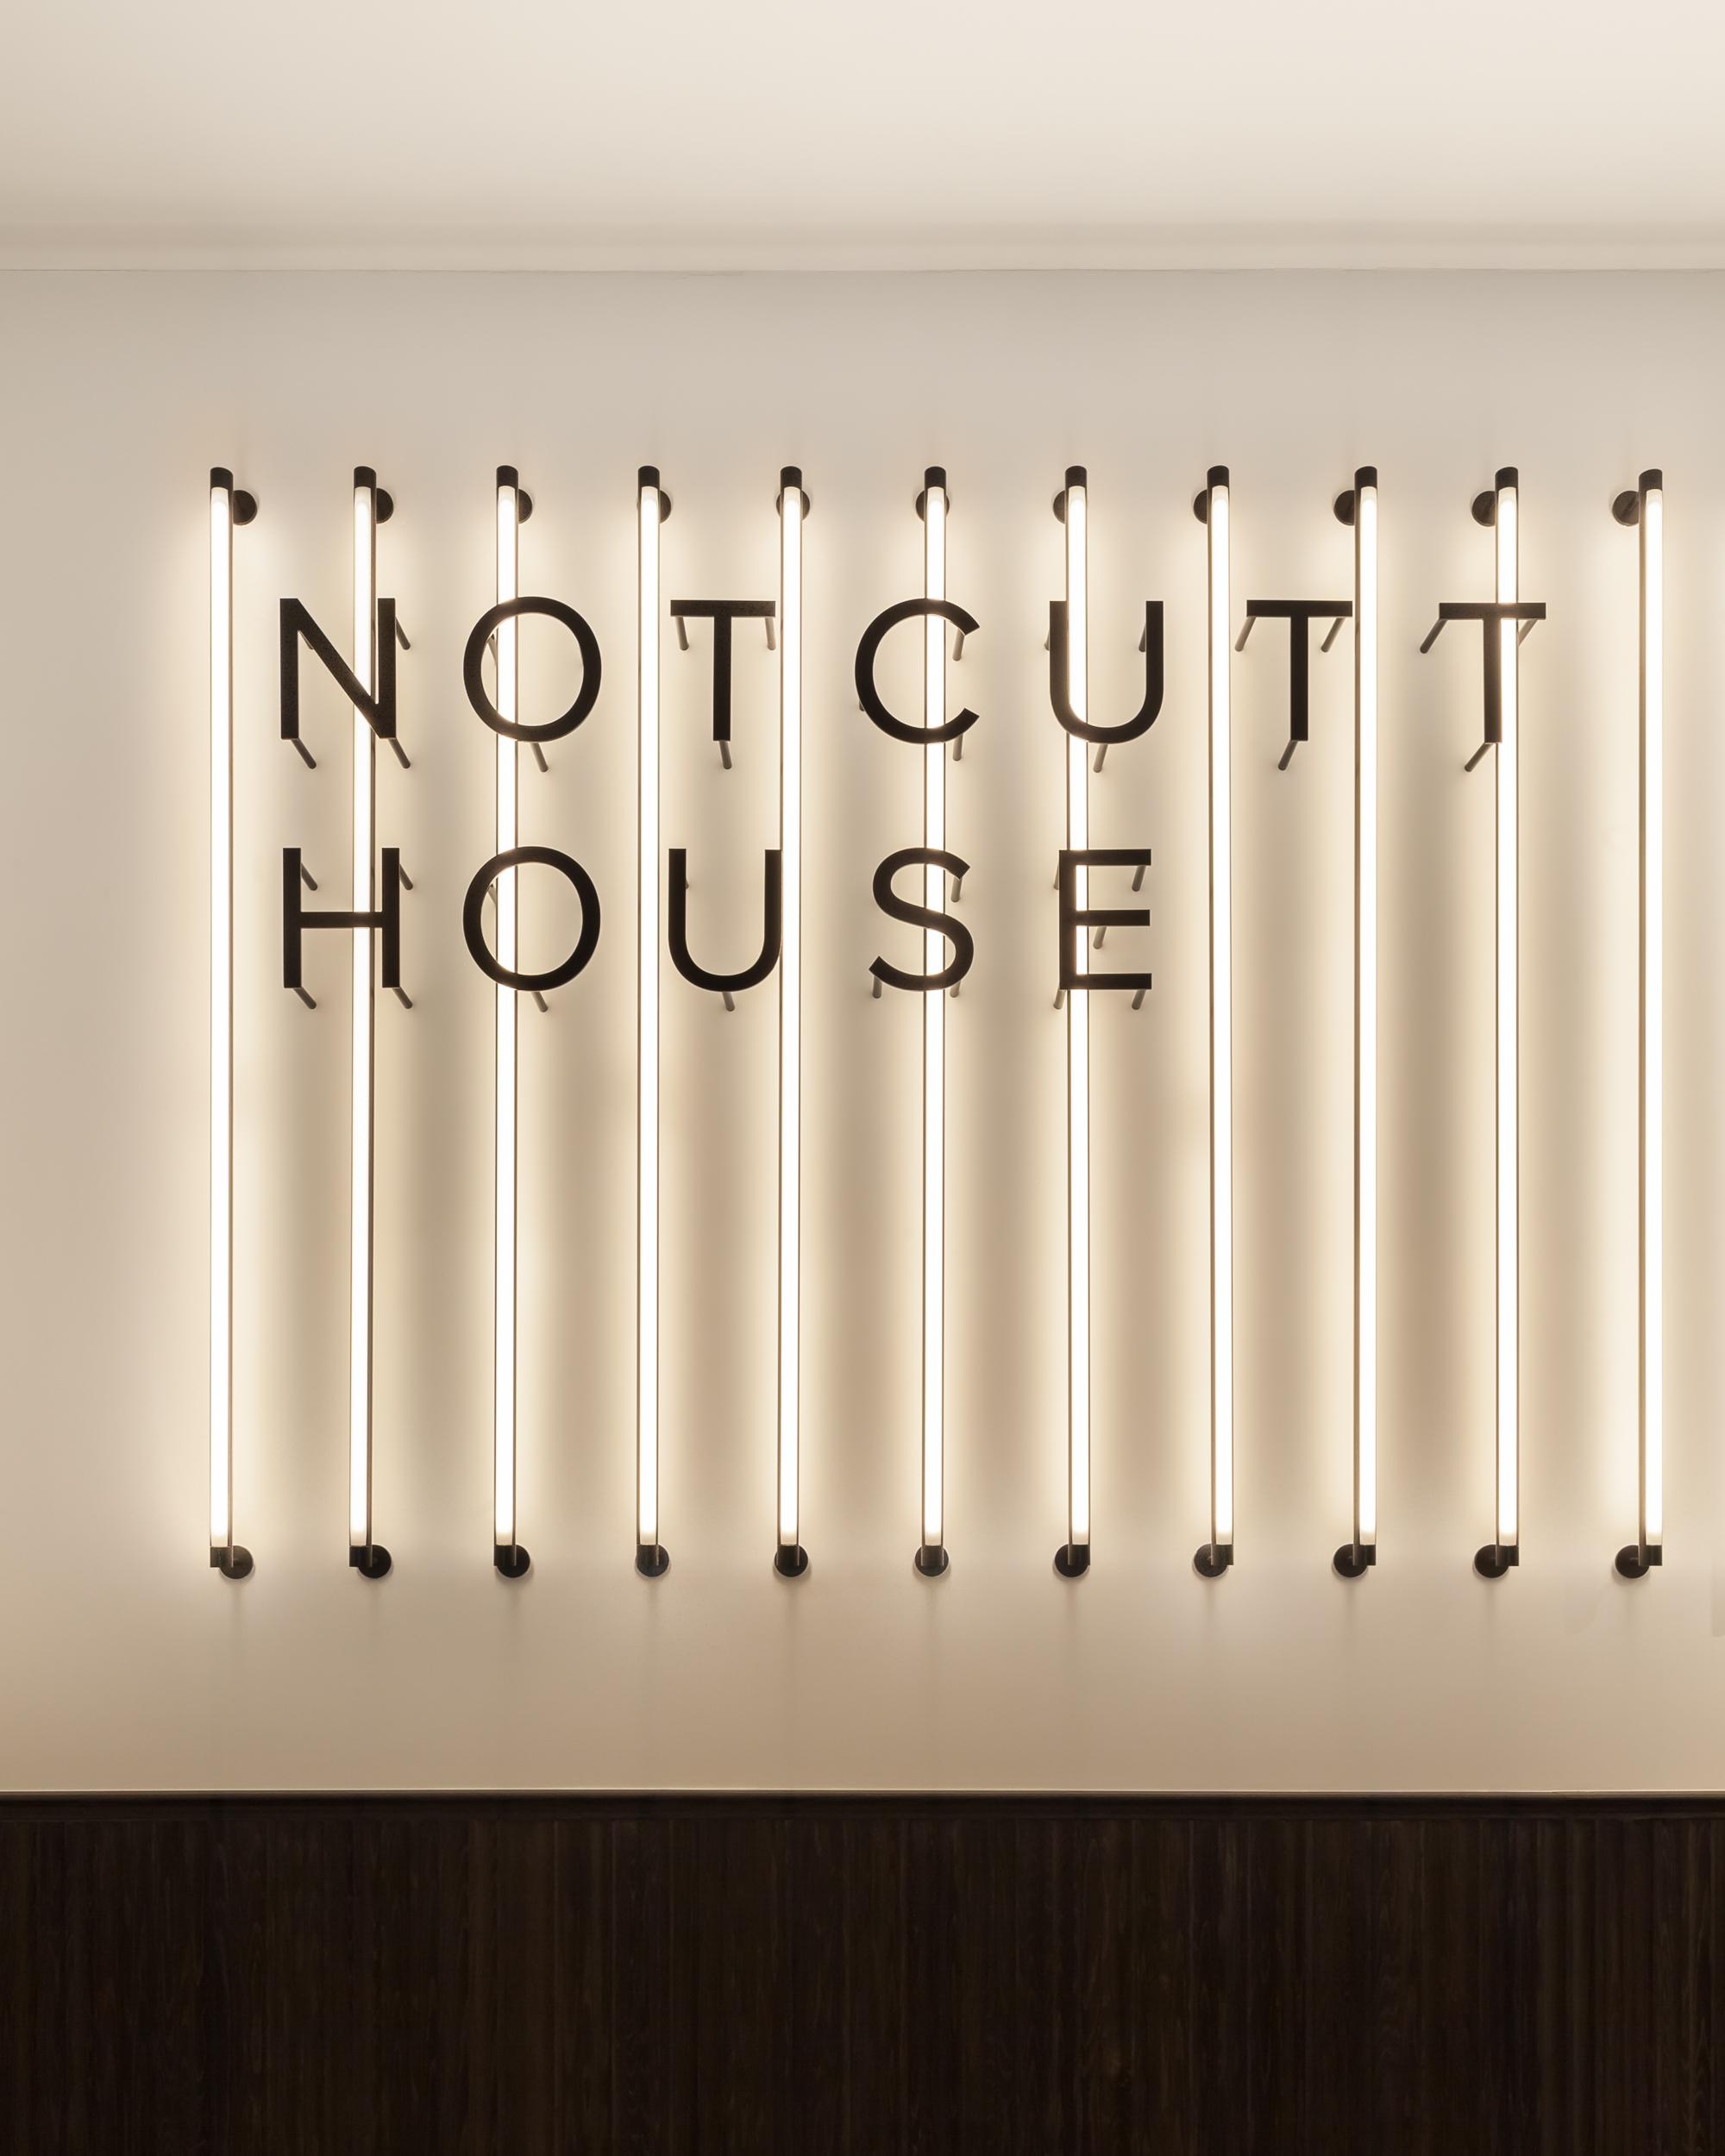 IMG_1807-Edit - Notcutt_House_BGY.jpg